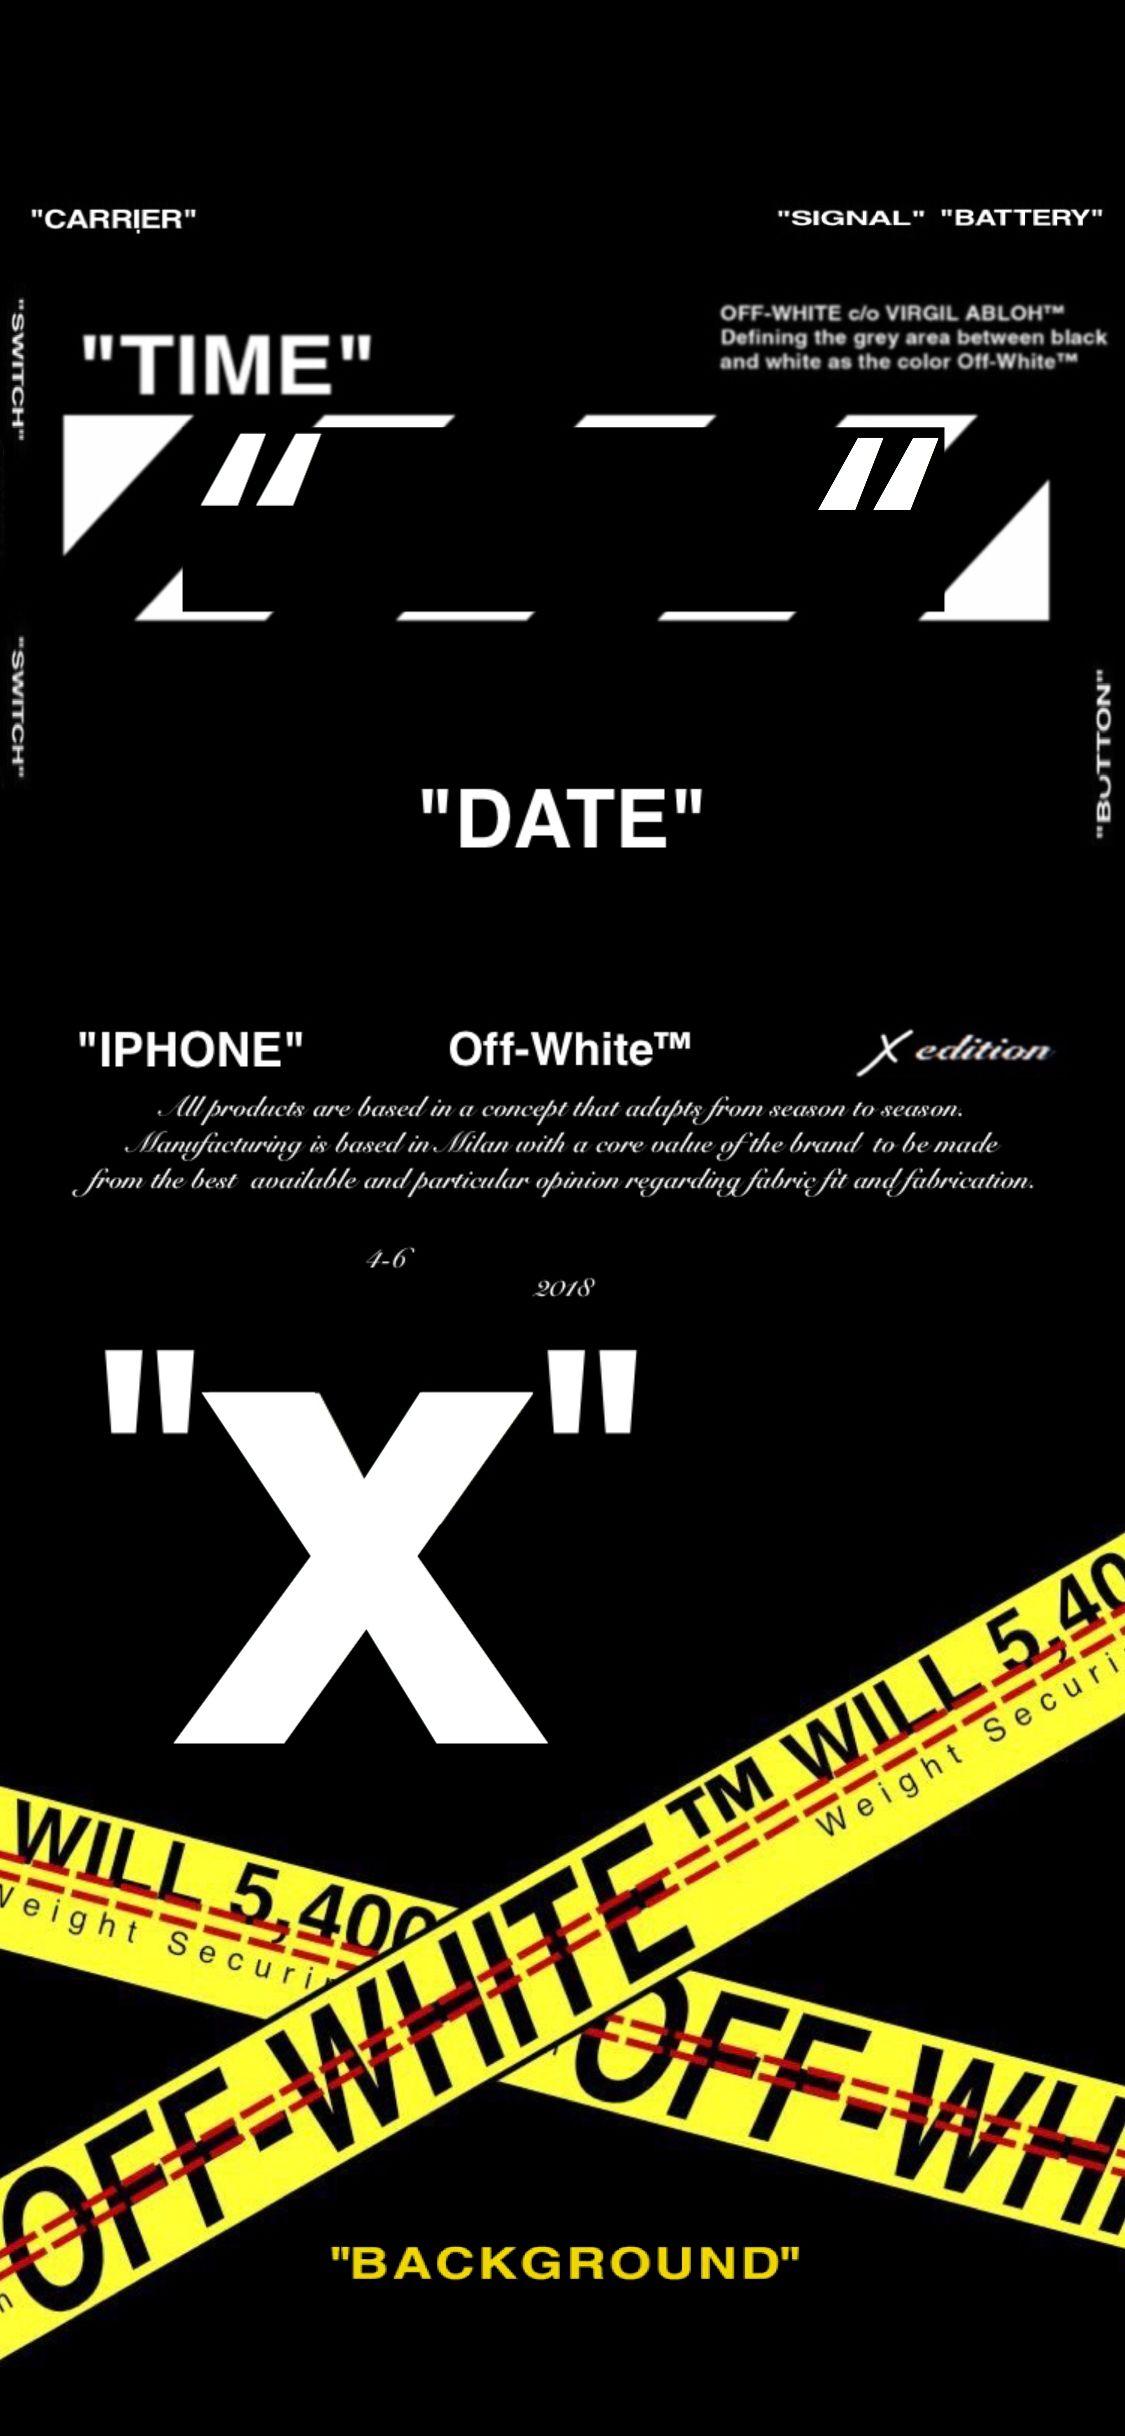 iPhone X edition Off White wallpaper | Fondos de pantalla en 2019 | 아이폰 월페이퍼, 아이폰 배경화면 y 배경화면